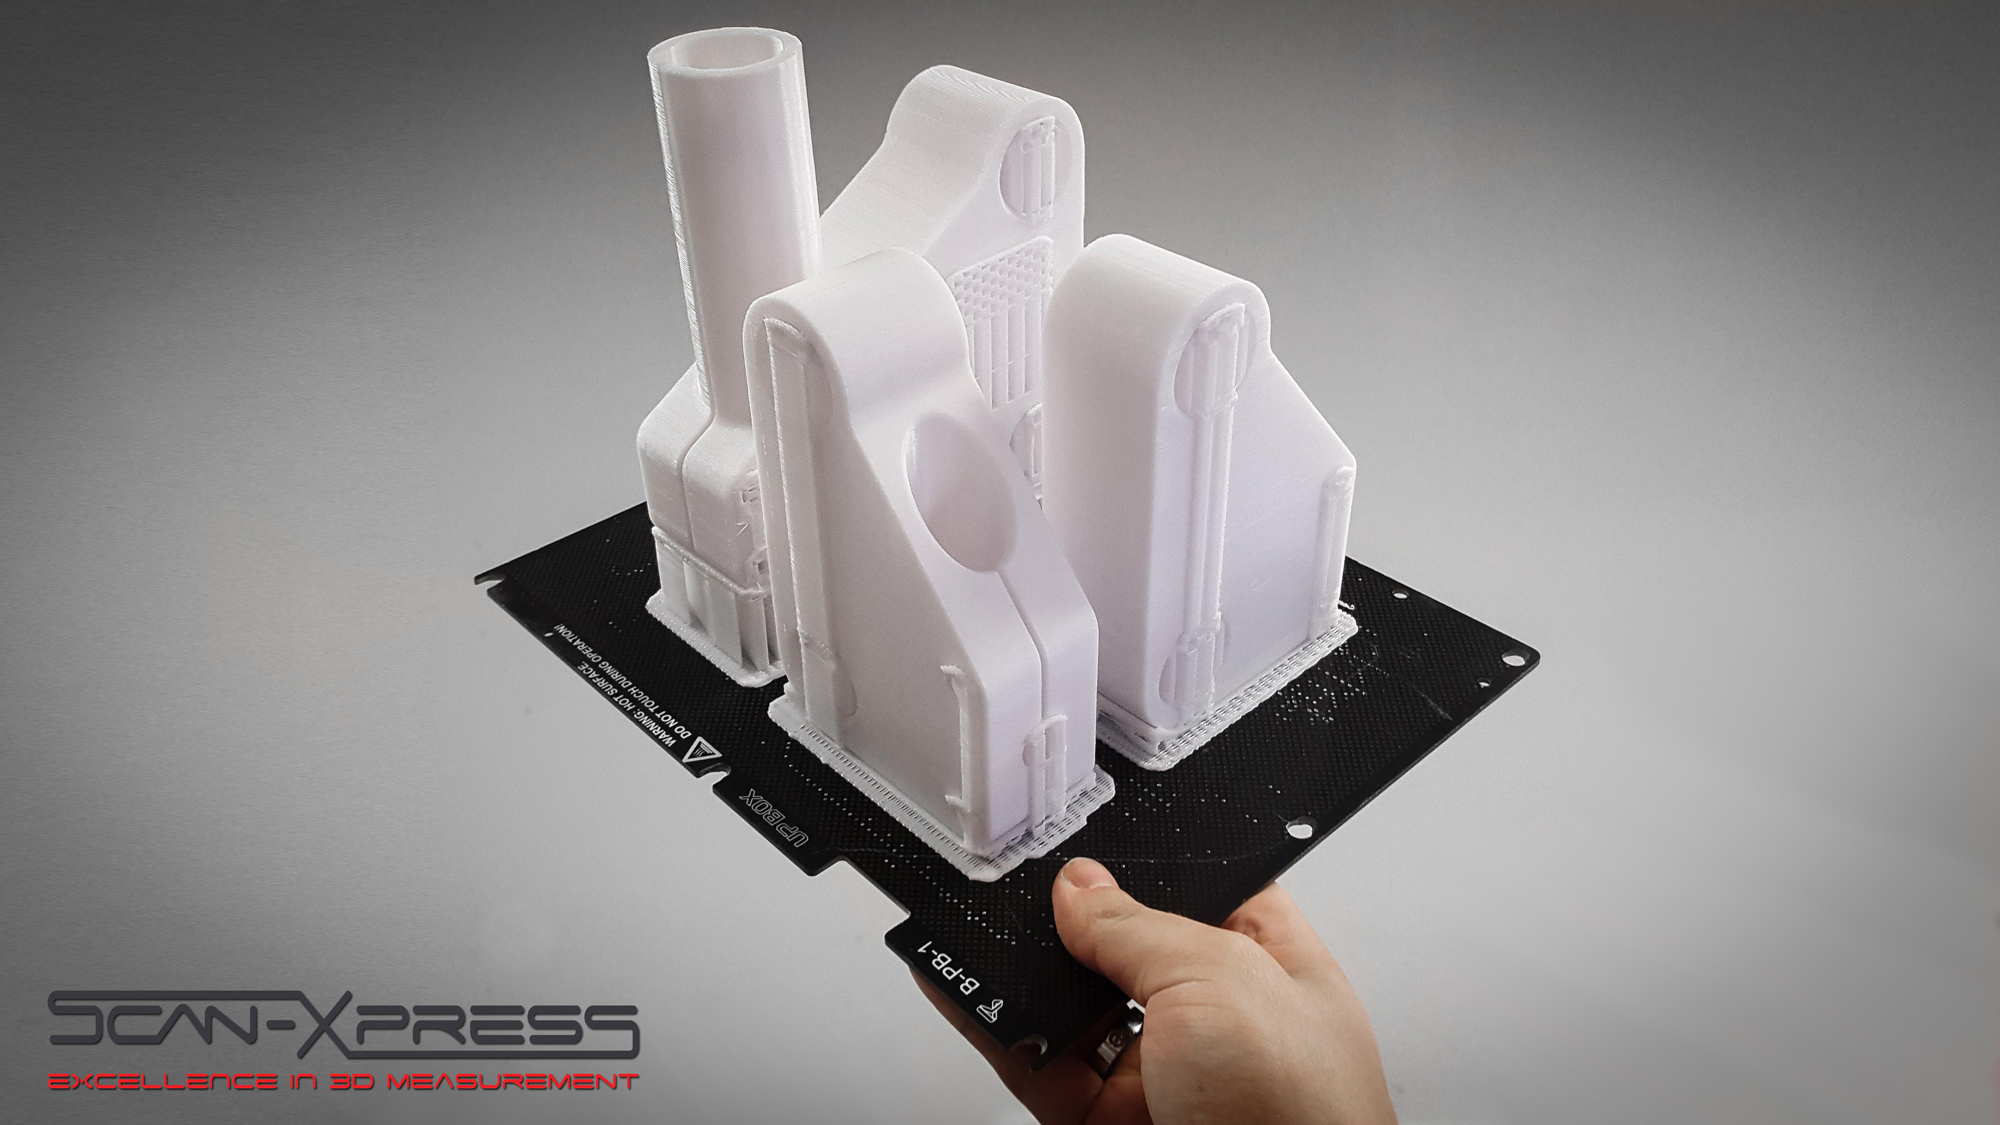 3D Printed Jigs for E-bike - Scan-Xpress